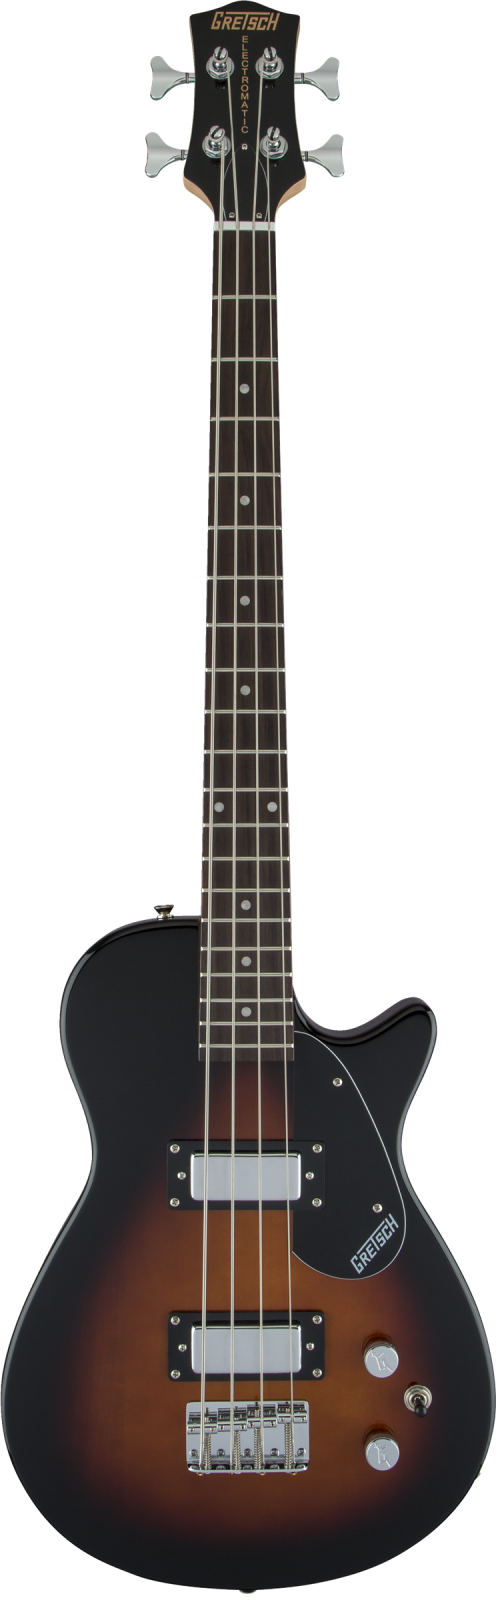 Gretsch G2220 Electromatic Junior Jet Bass II Short-Scale Black Walnut Fingerboard Tobacco Sunburst